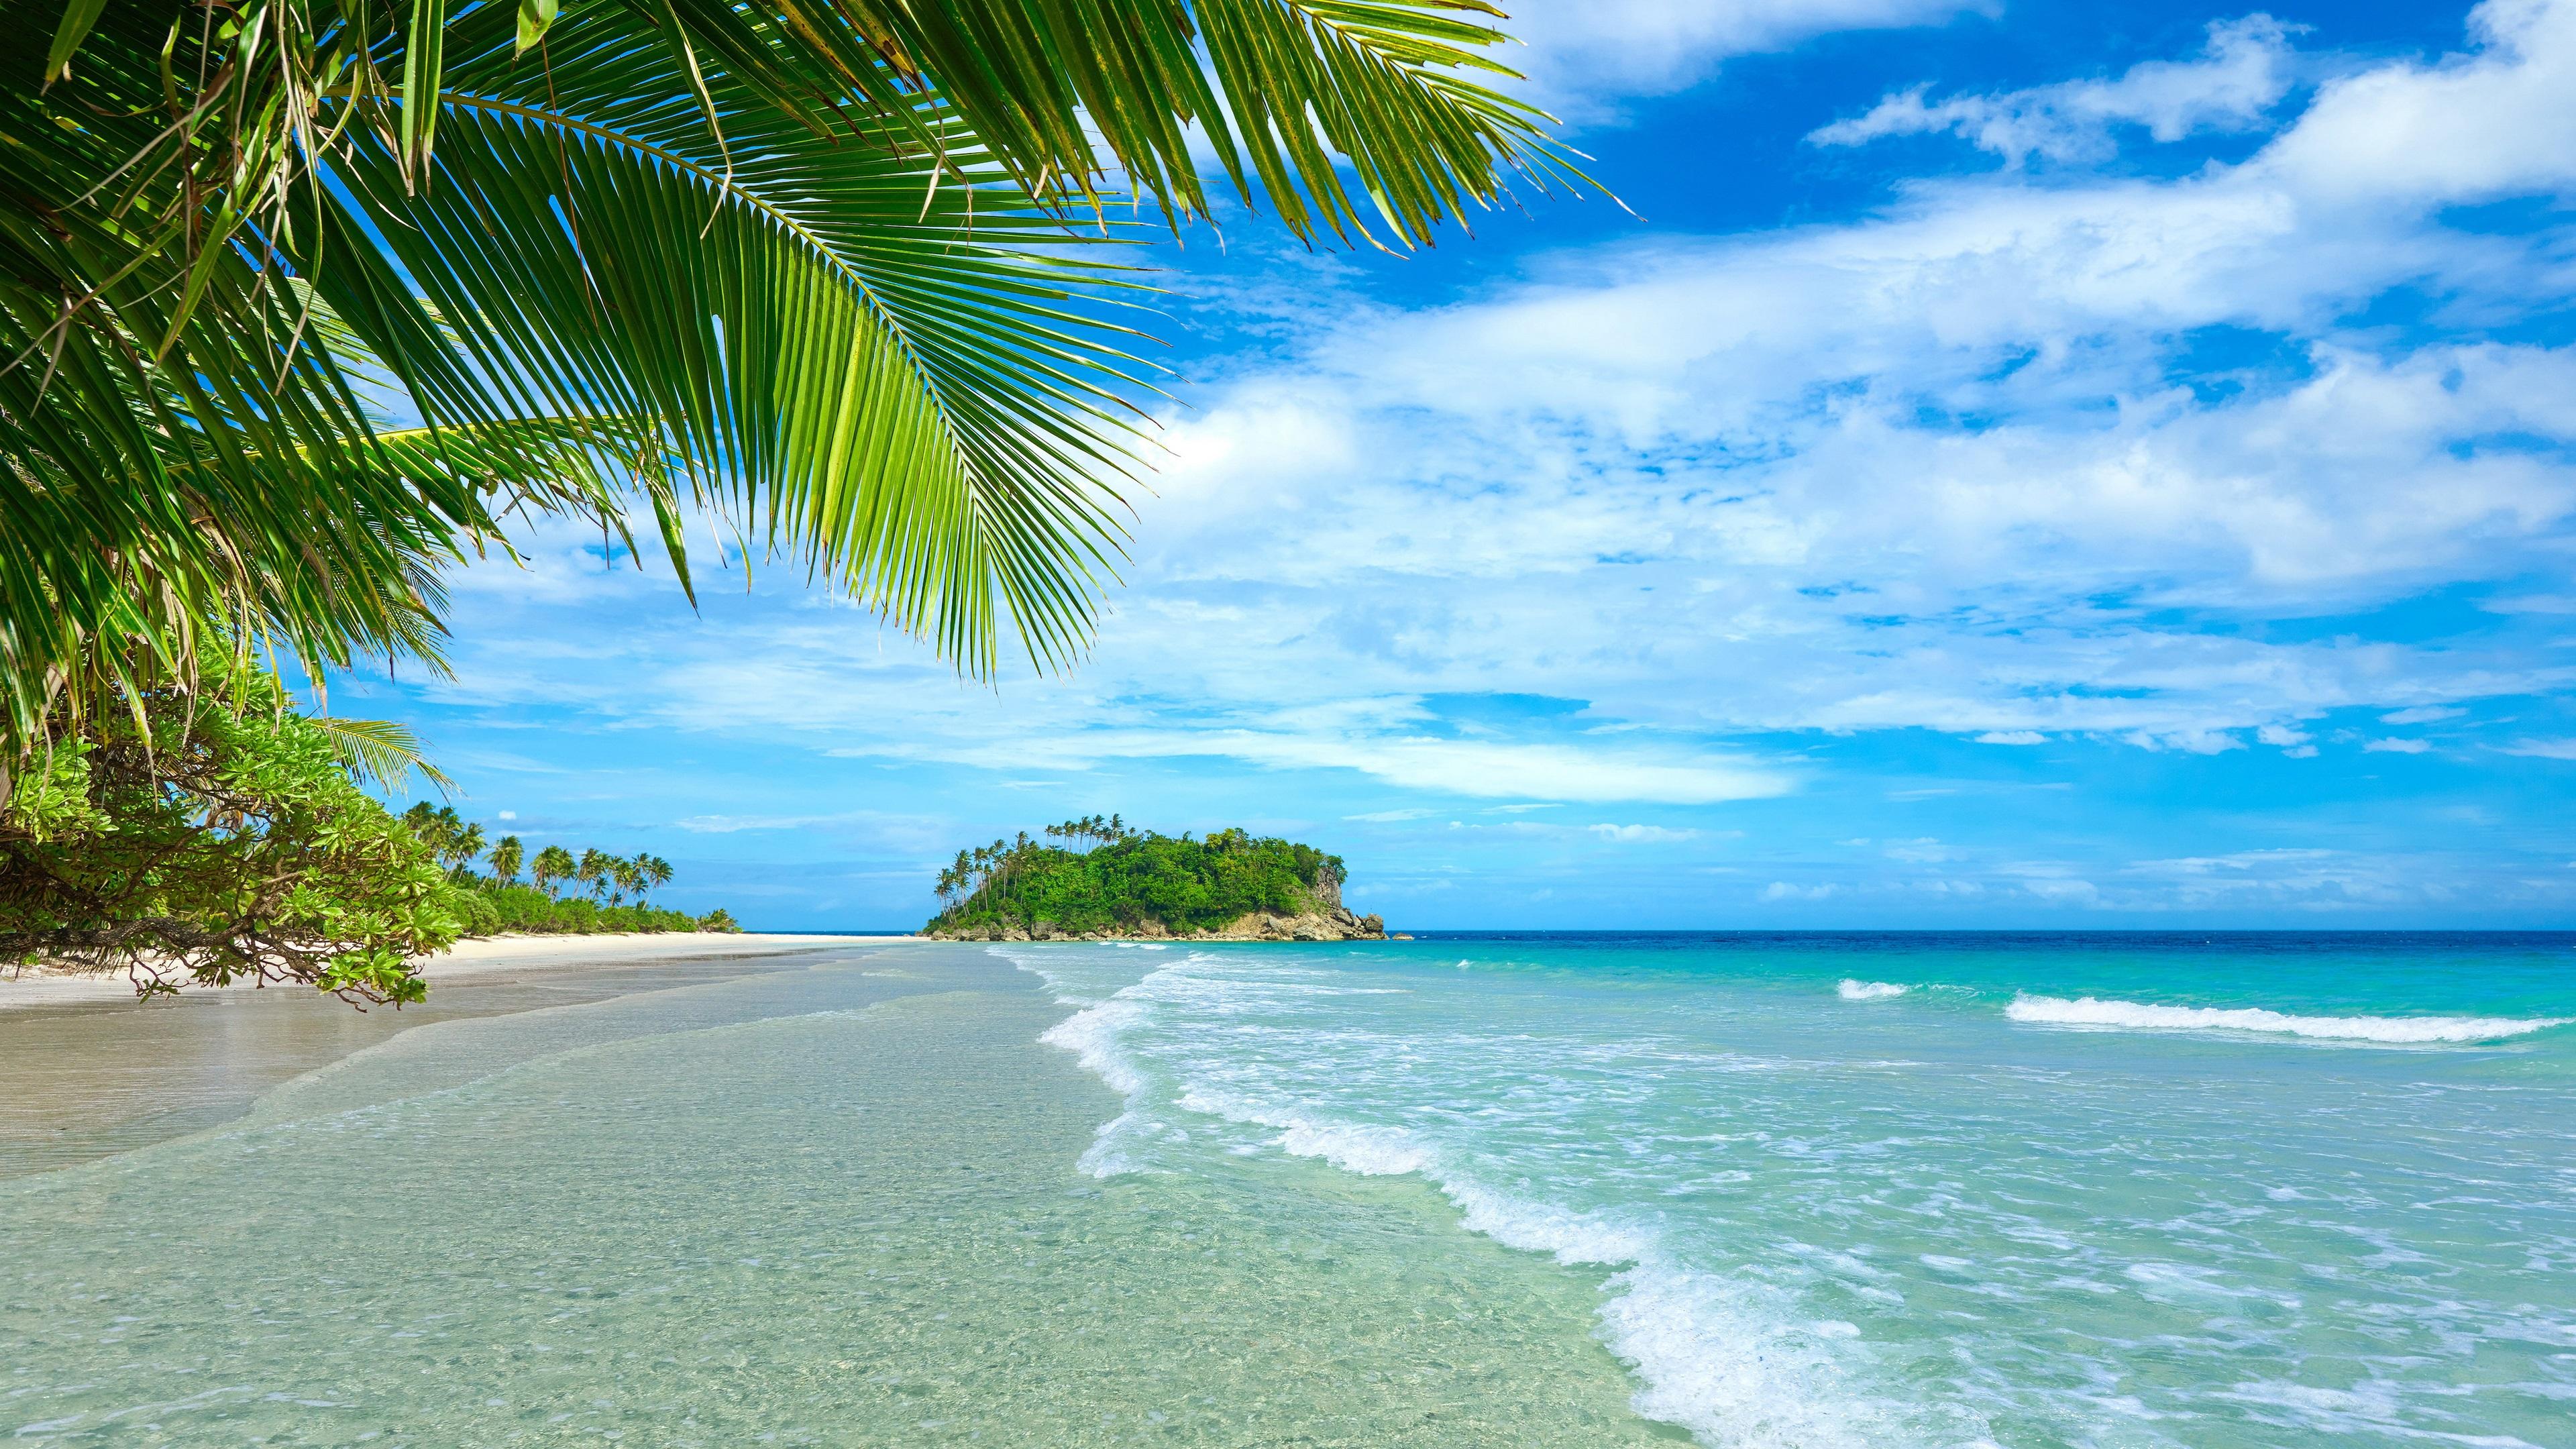 trinidad обои